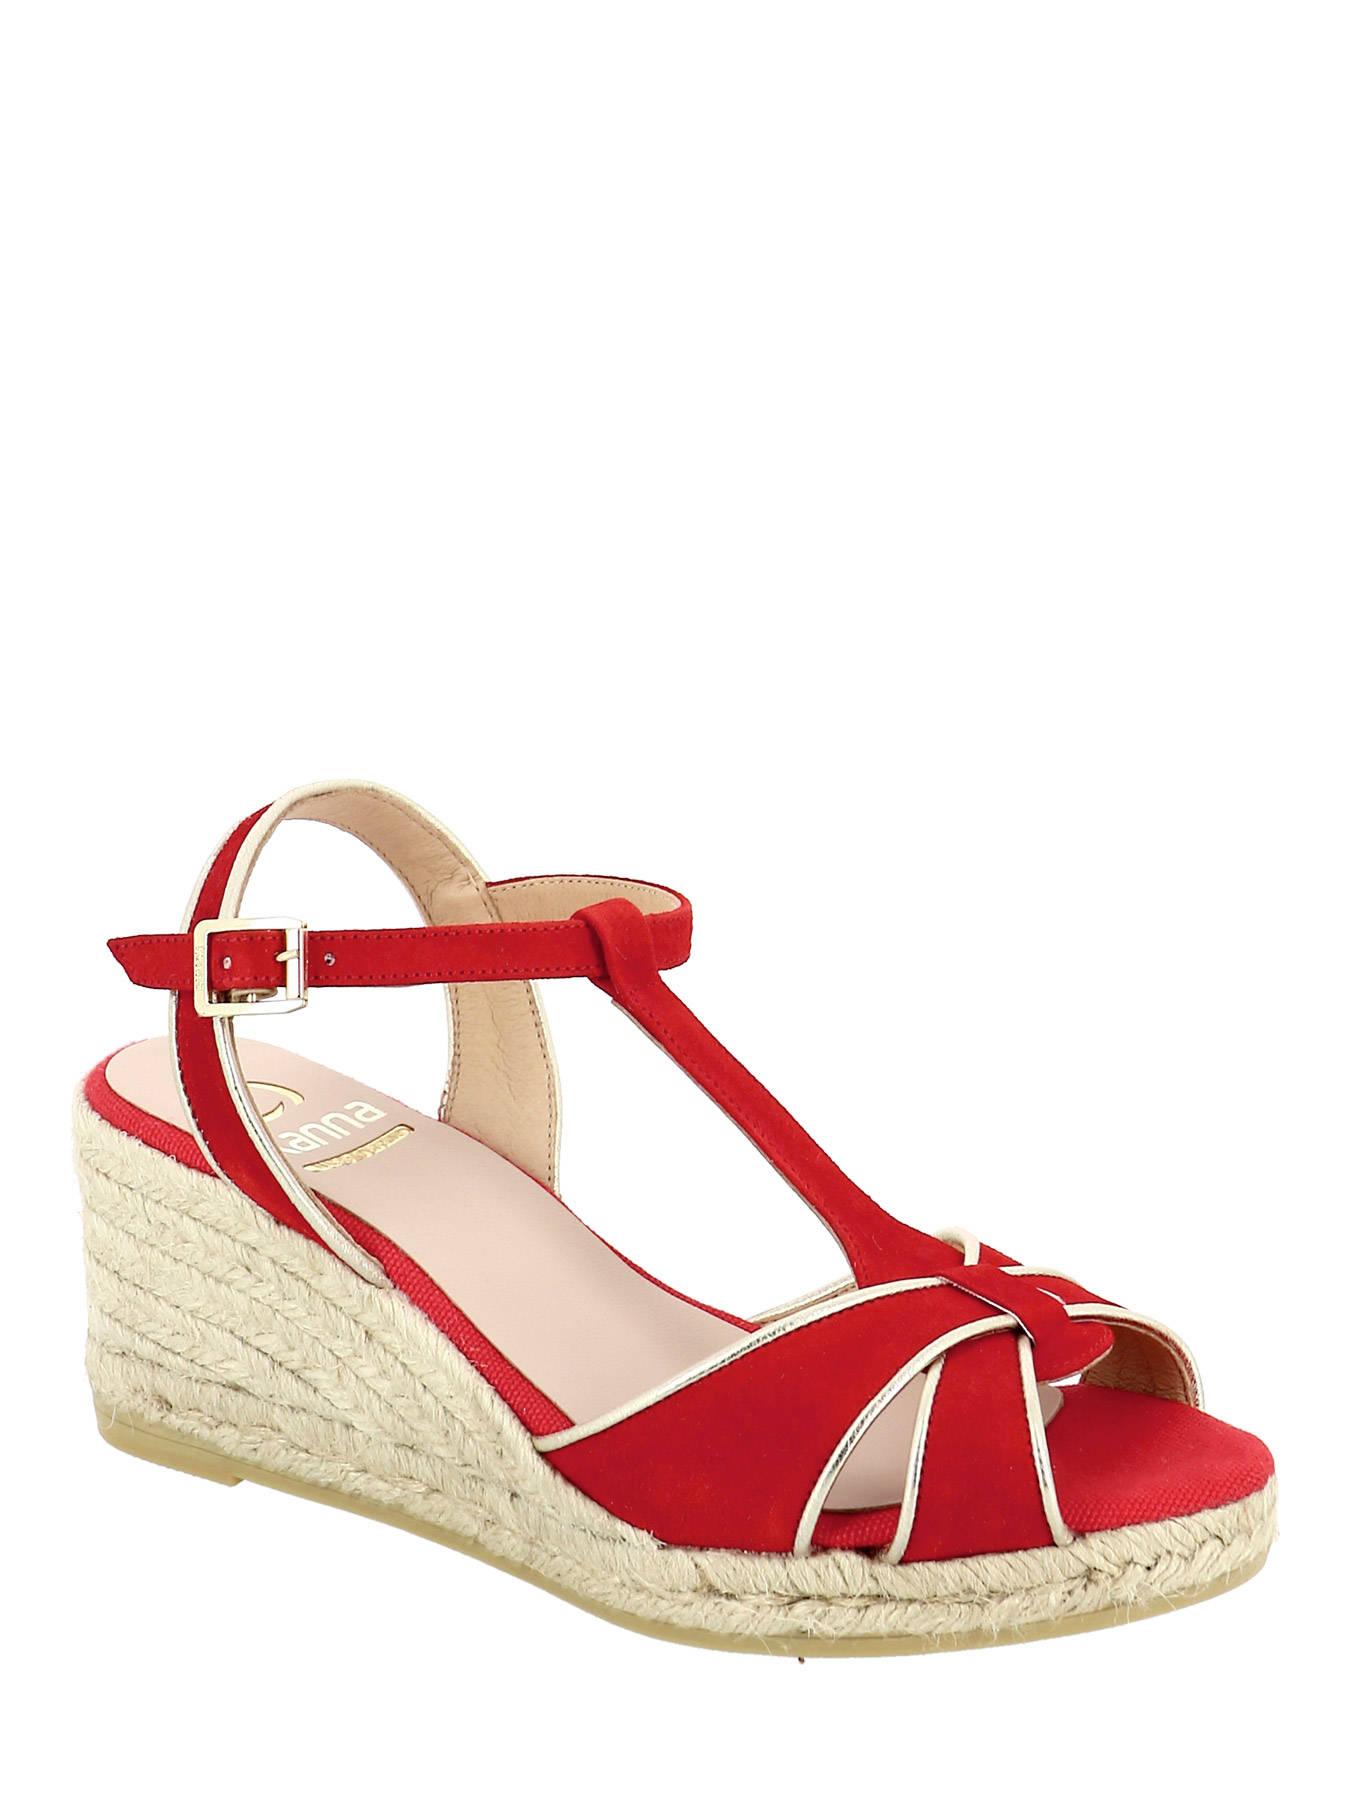 6c70b2185f2e Kanna Sandals flip-flops KV0559.LAURA - best prices